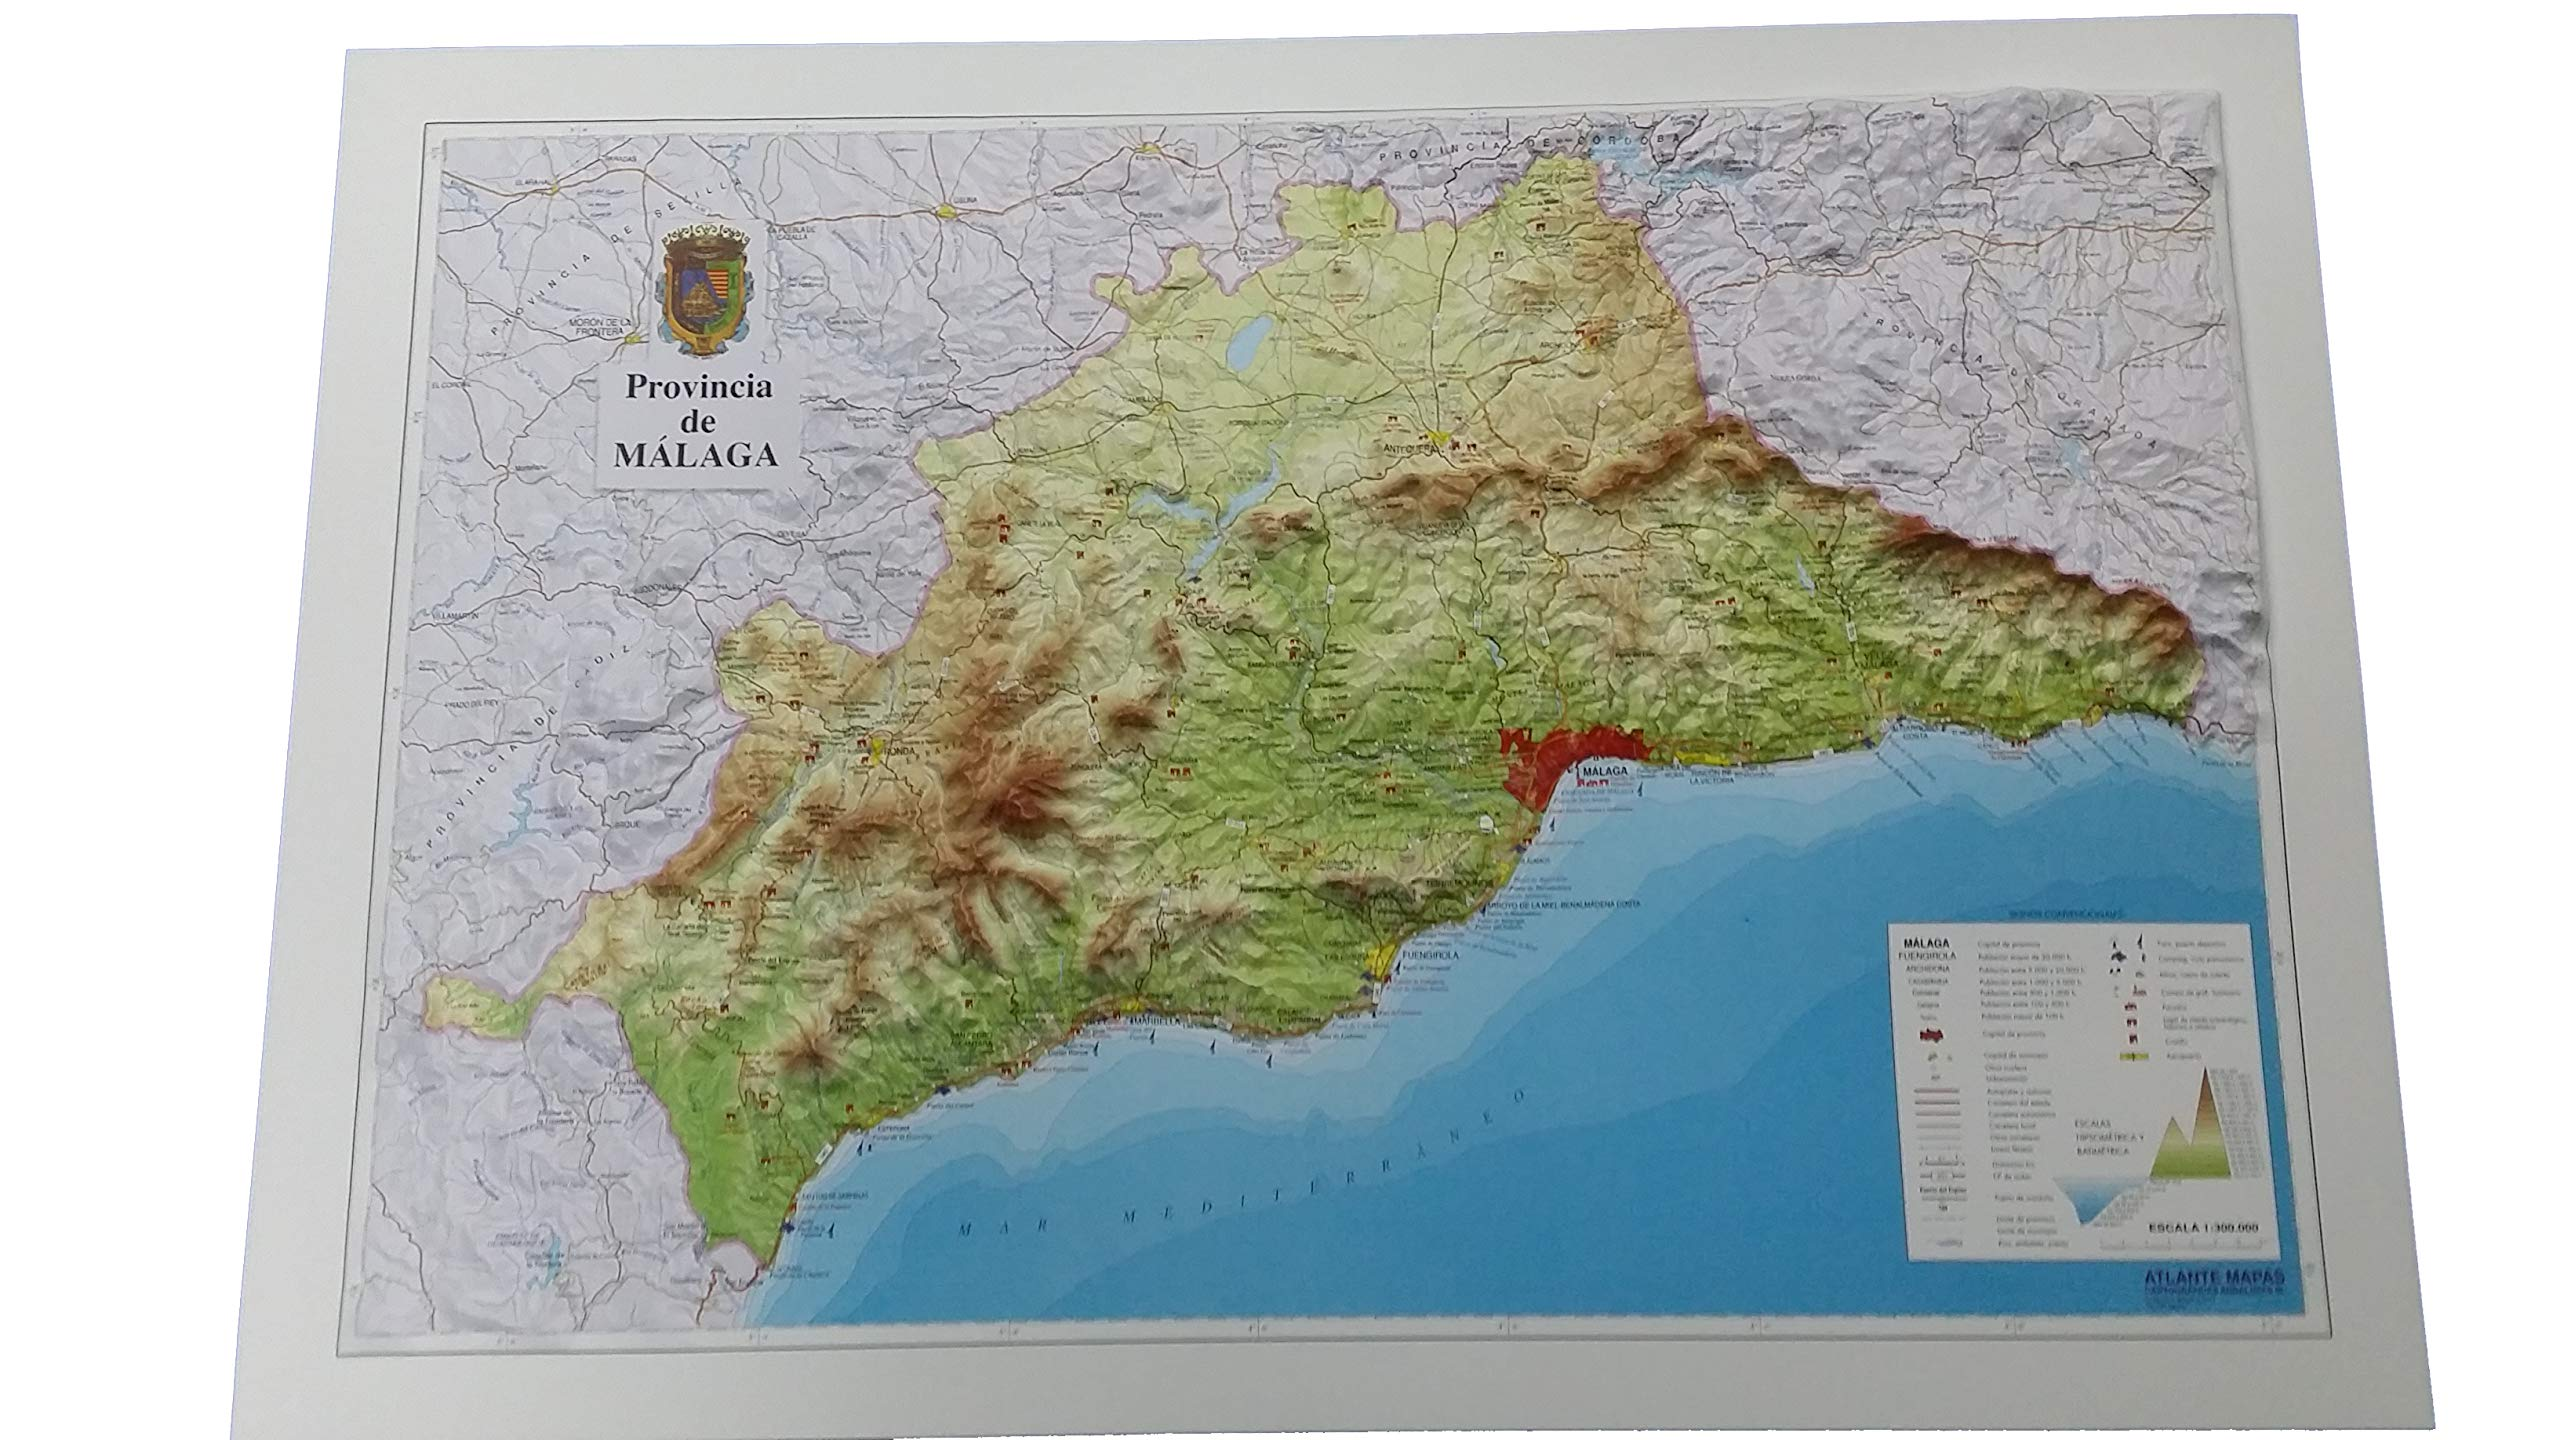 Mapa en relieve de Málaga: Escala 1:300.000: Amazon.es: All 3D Form, S.L.: Libros